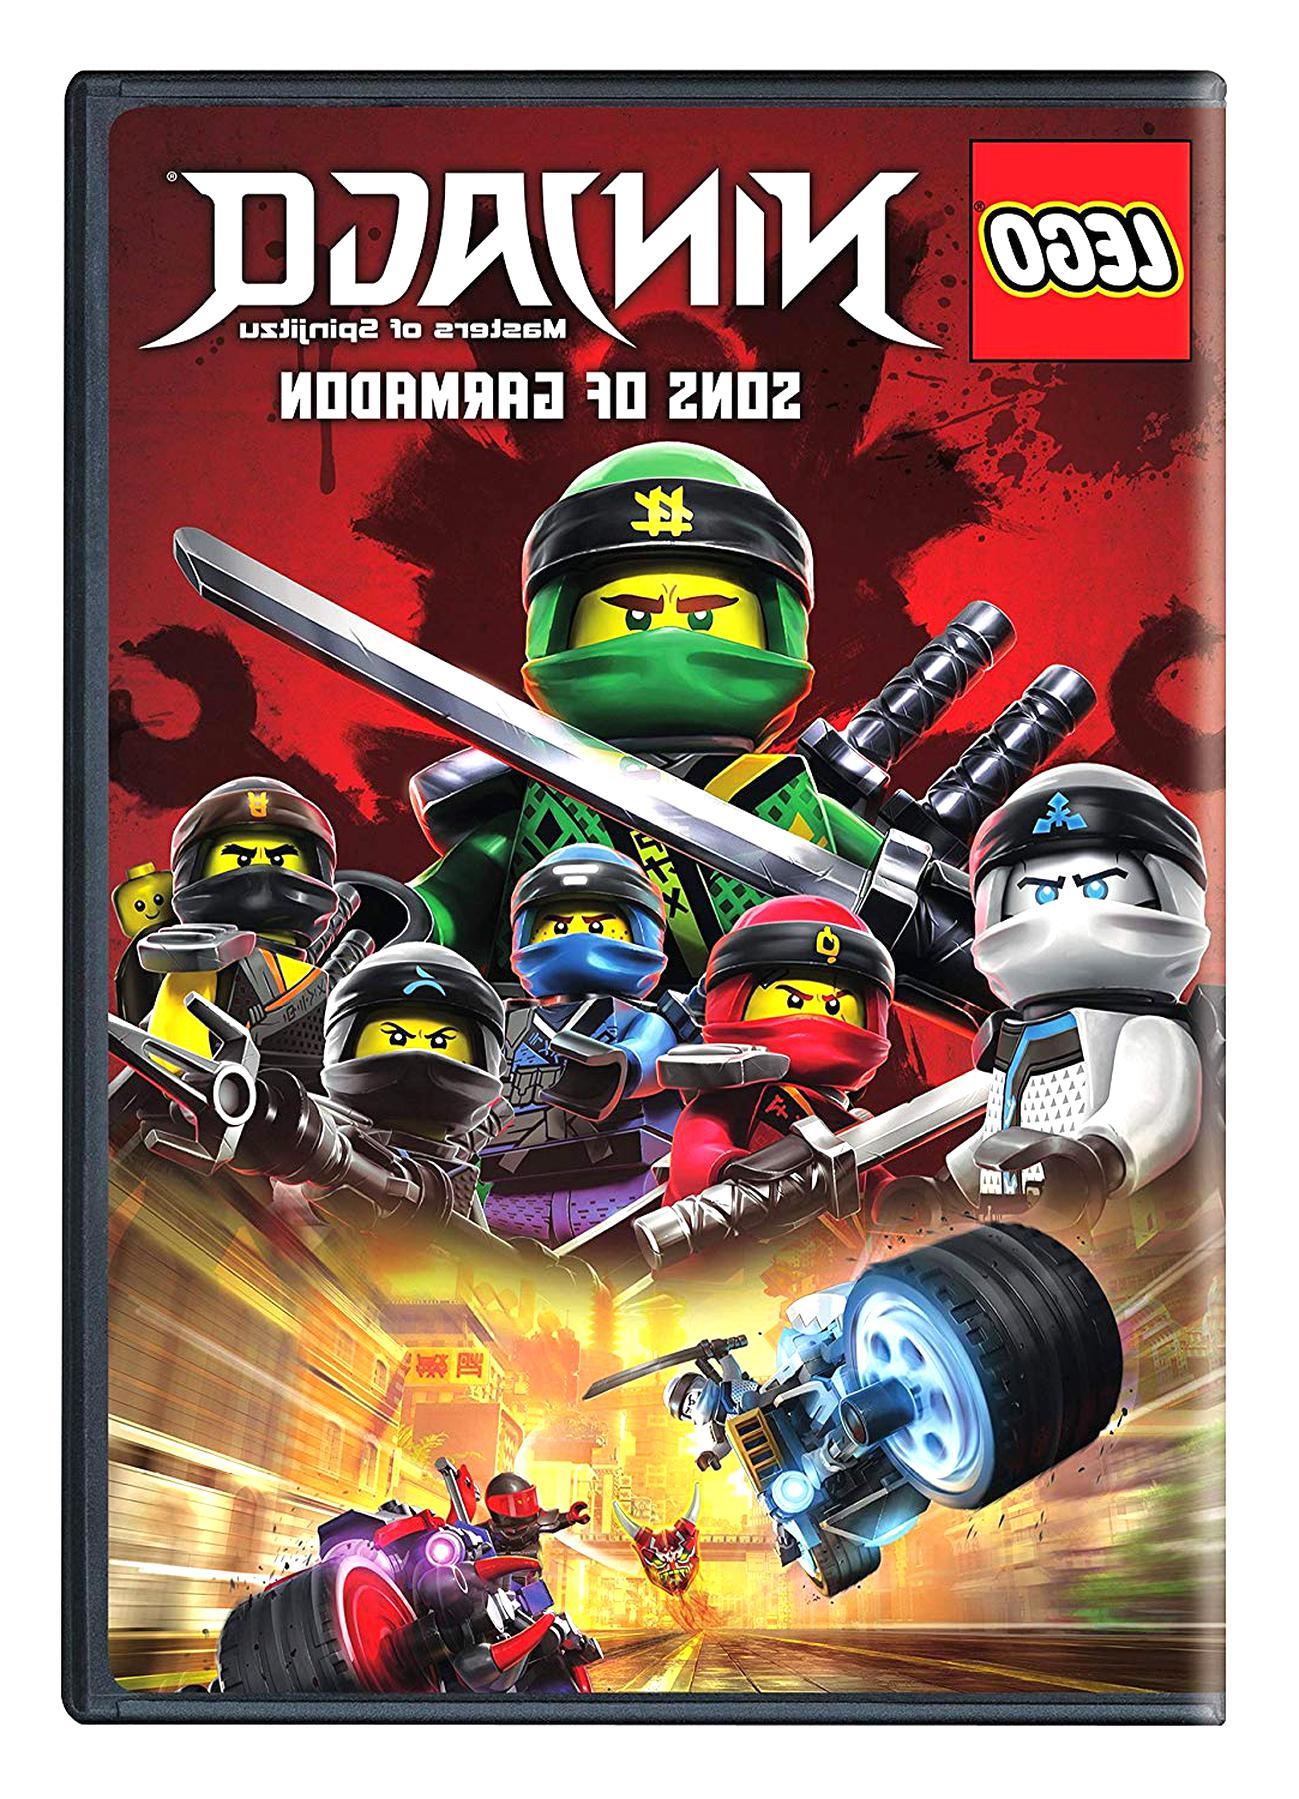 ninjago dvd gebraucht kaufen